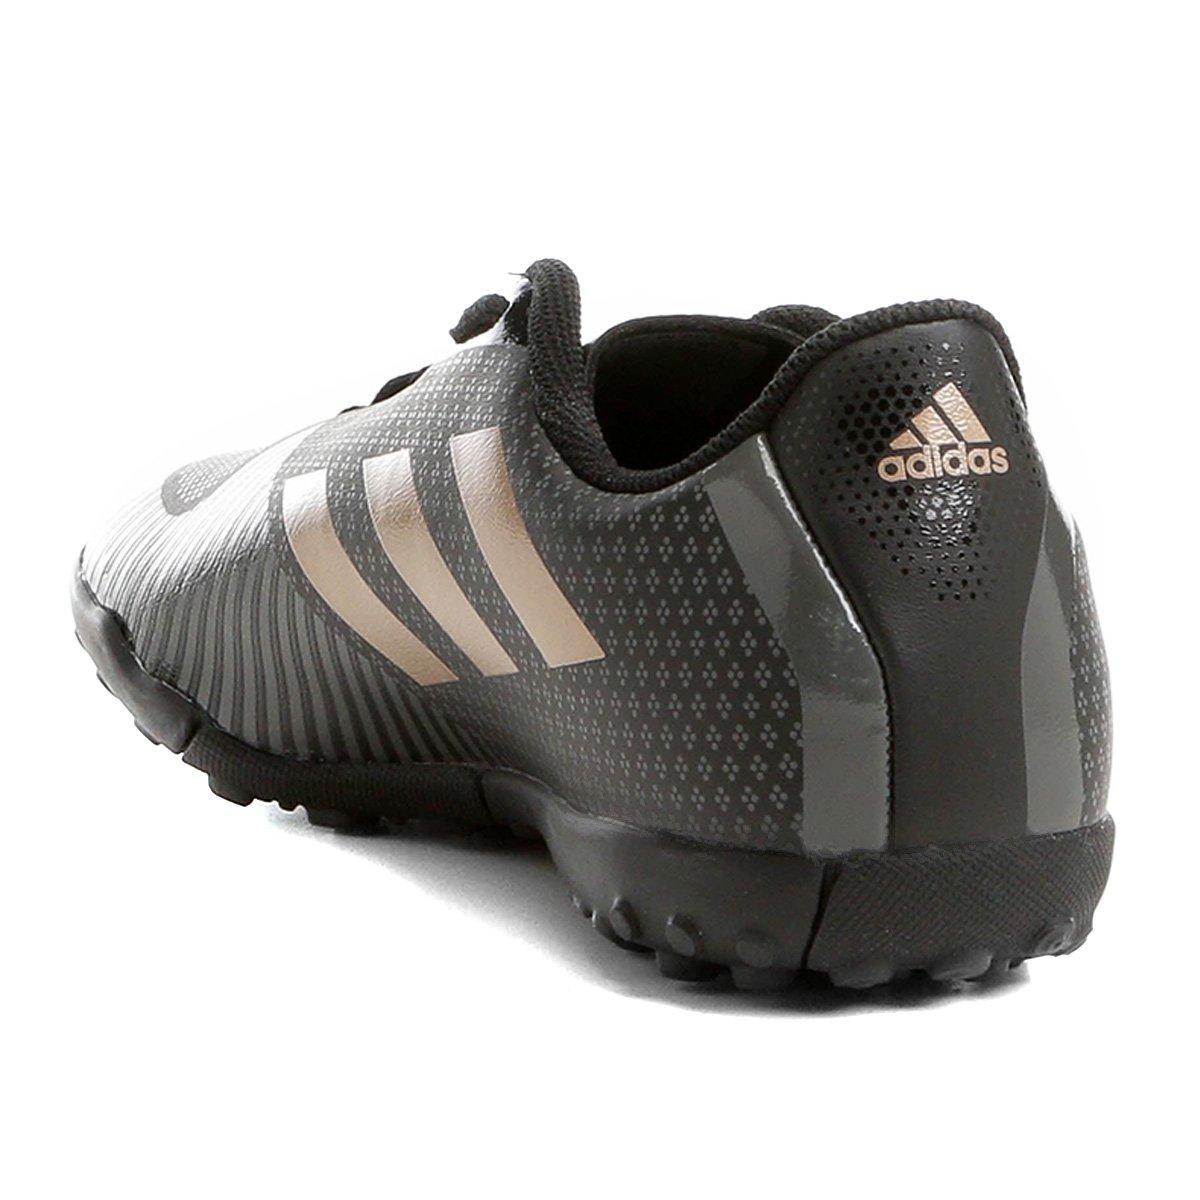 914099ef70 Chuteira Society Infantil Adidas Artilheira 18 TF - Compre Agora ...